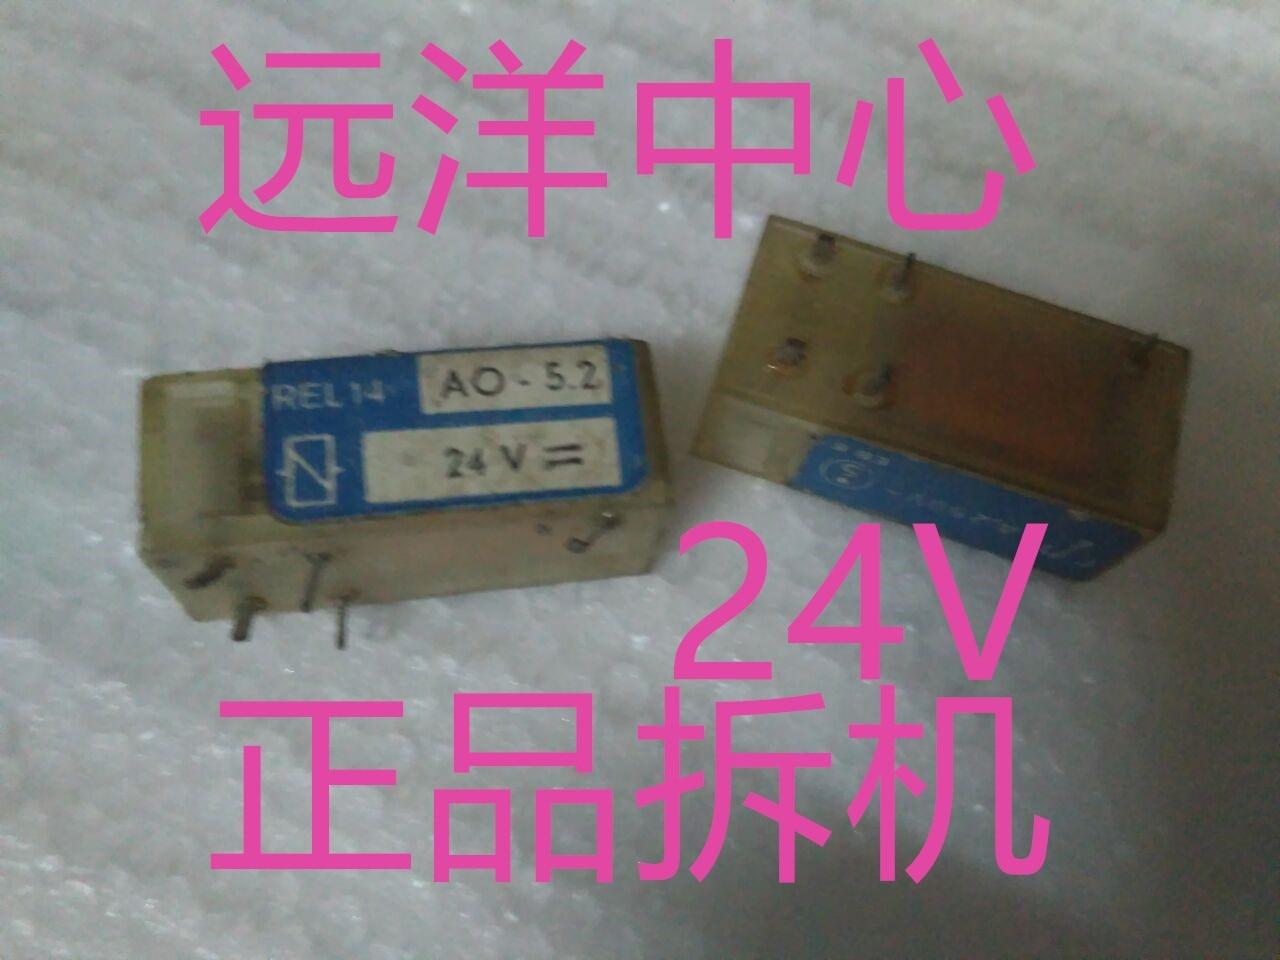 REL14 AO-5.2 24V  5 REL14-AO-5.2-24V  A0-5.2 rel14 ao 5 2 12v 5 rel14 ao 5 2 12v a0 5 2